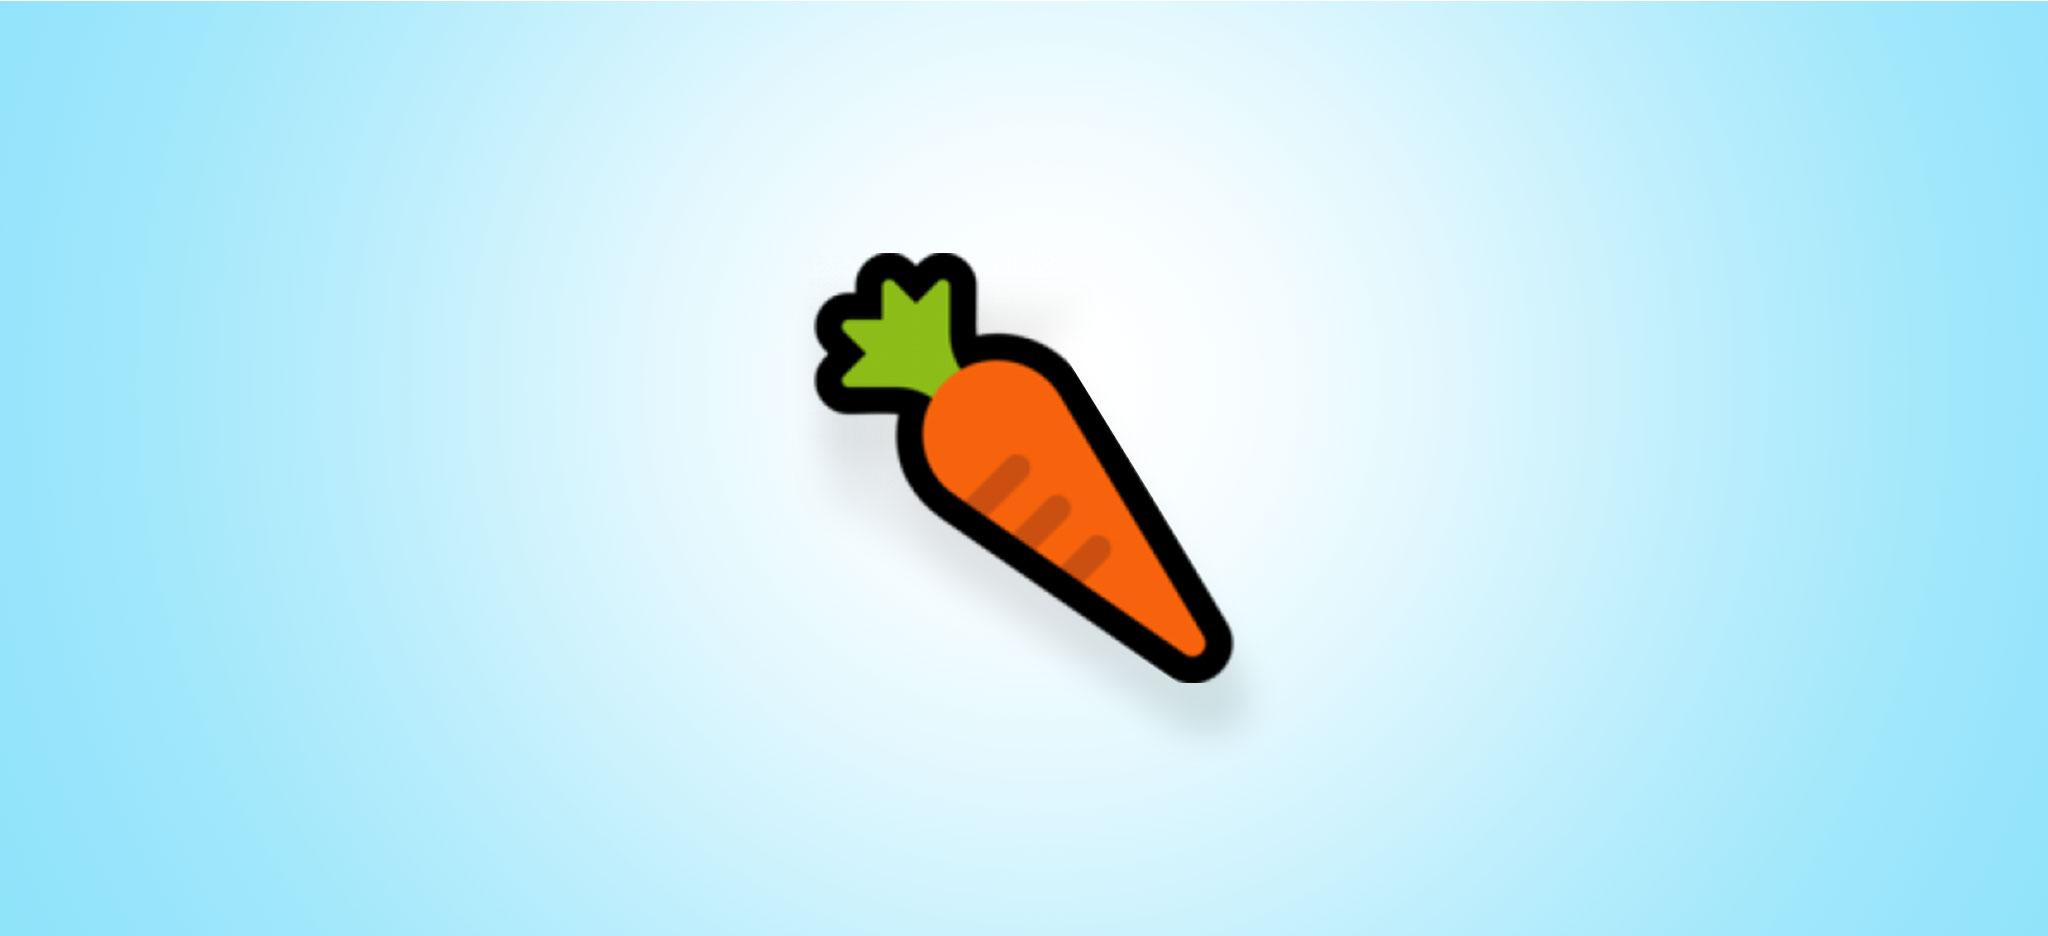 Carrot sextitng emoji